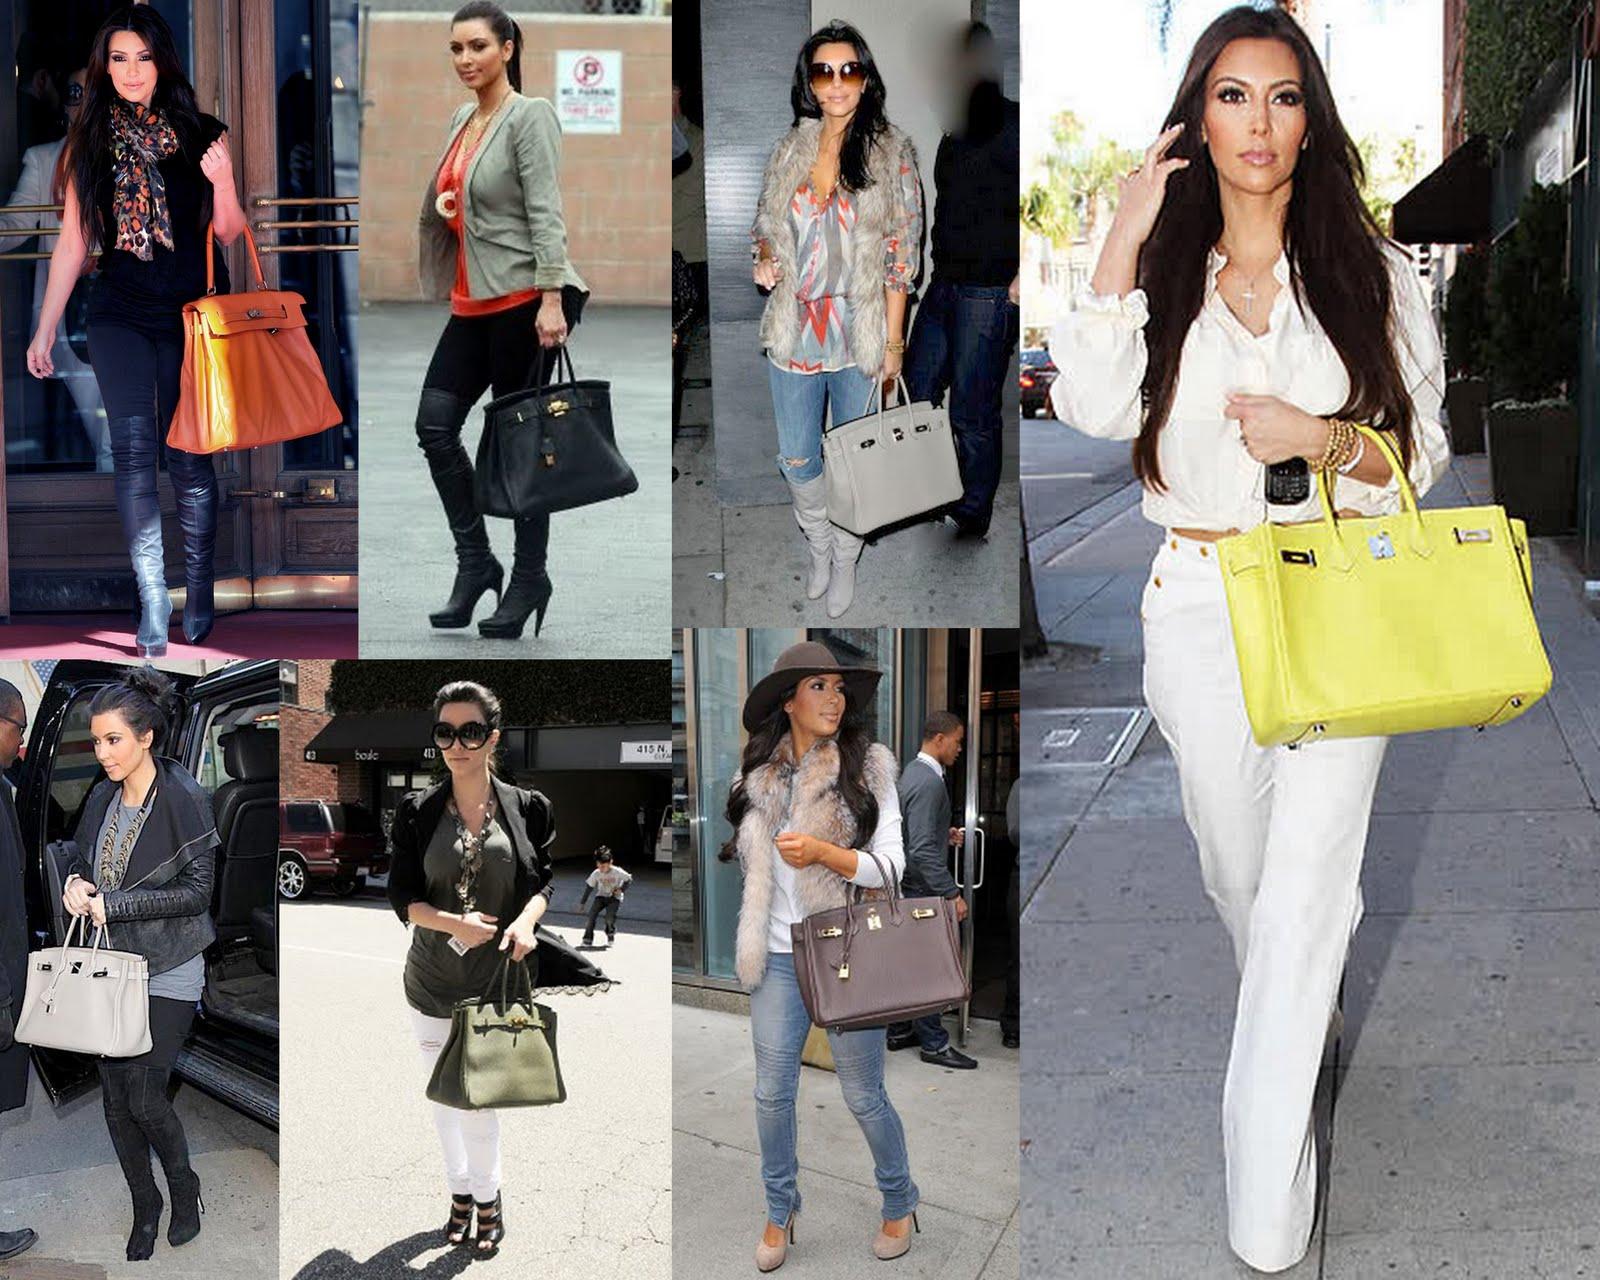 green birkin bag - Frills and Thrills: Keeping Up With The Kardashians & Their Birkin ...